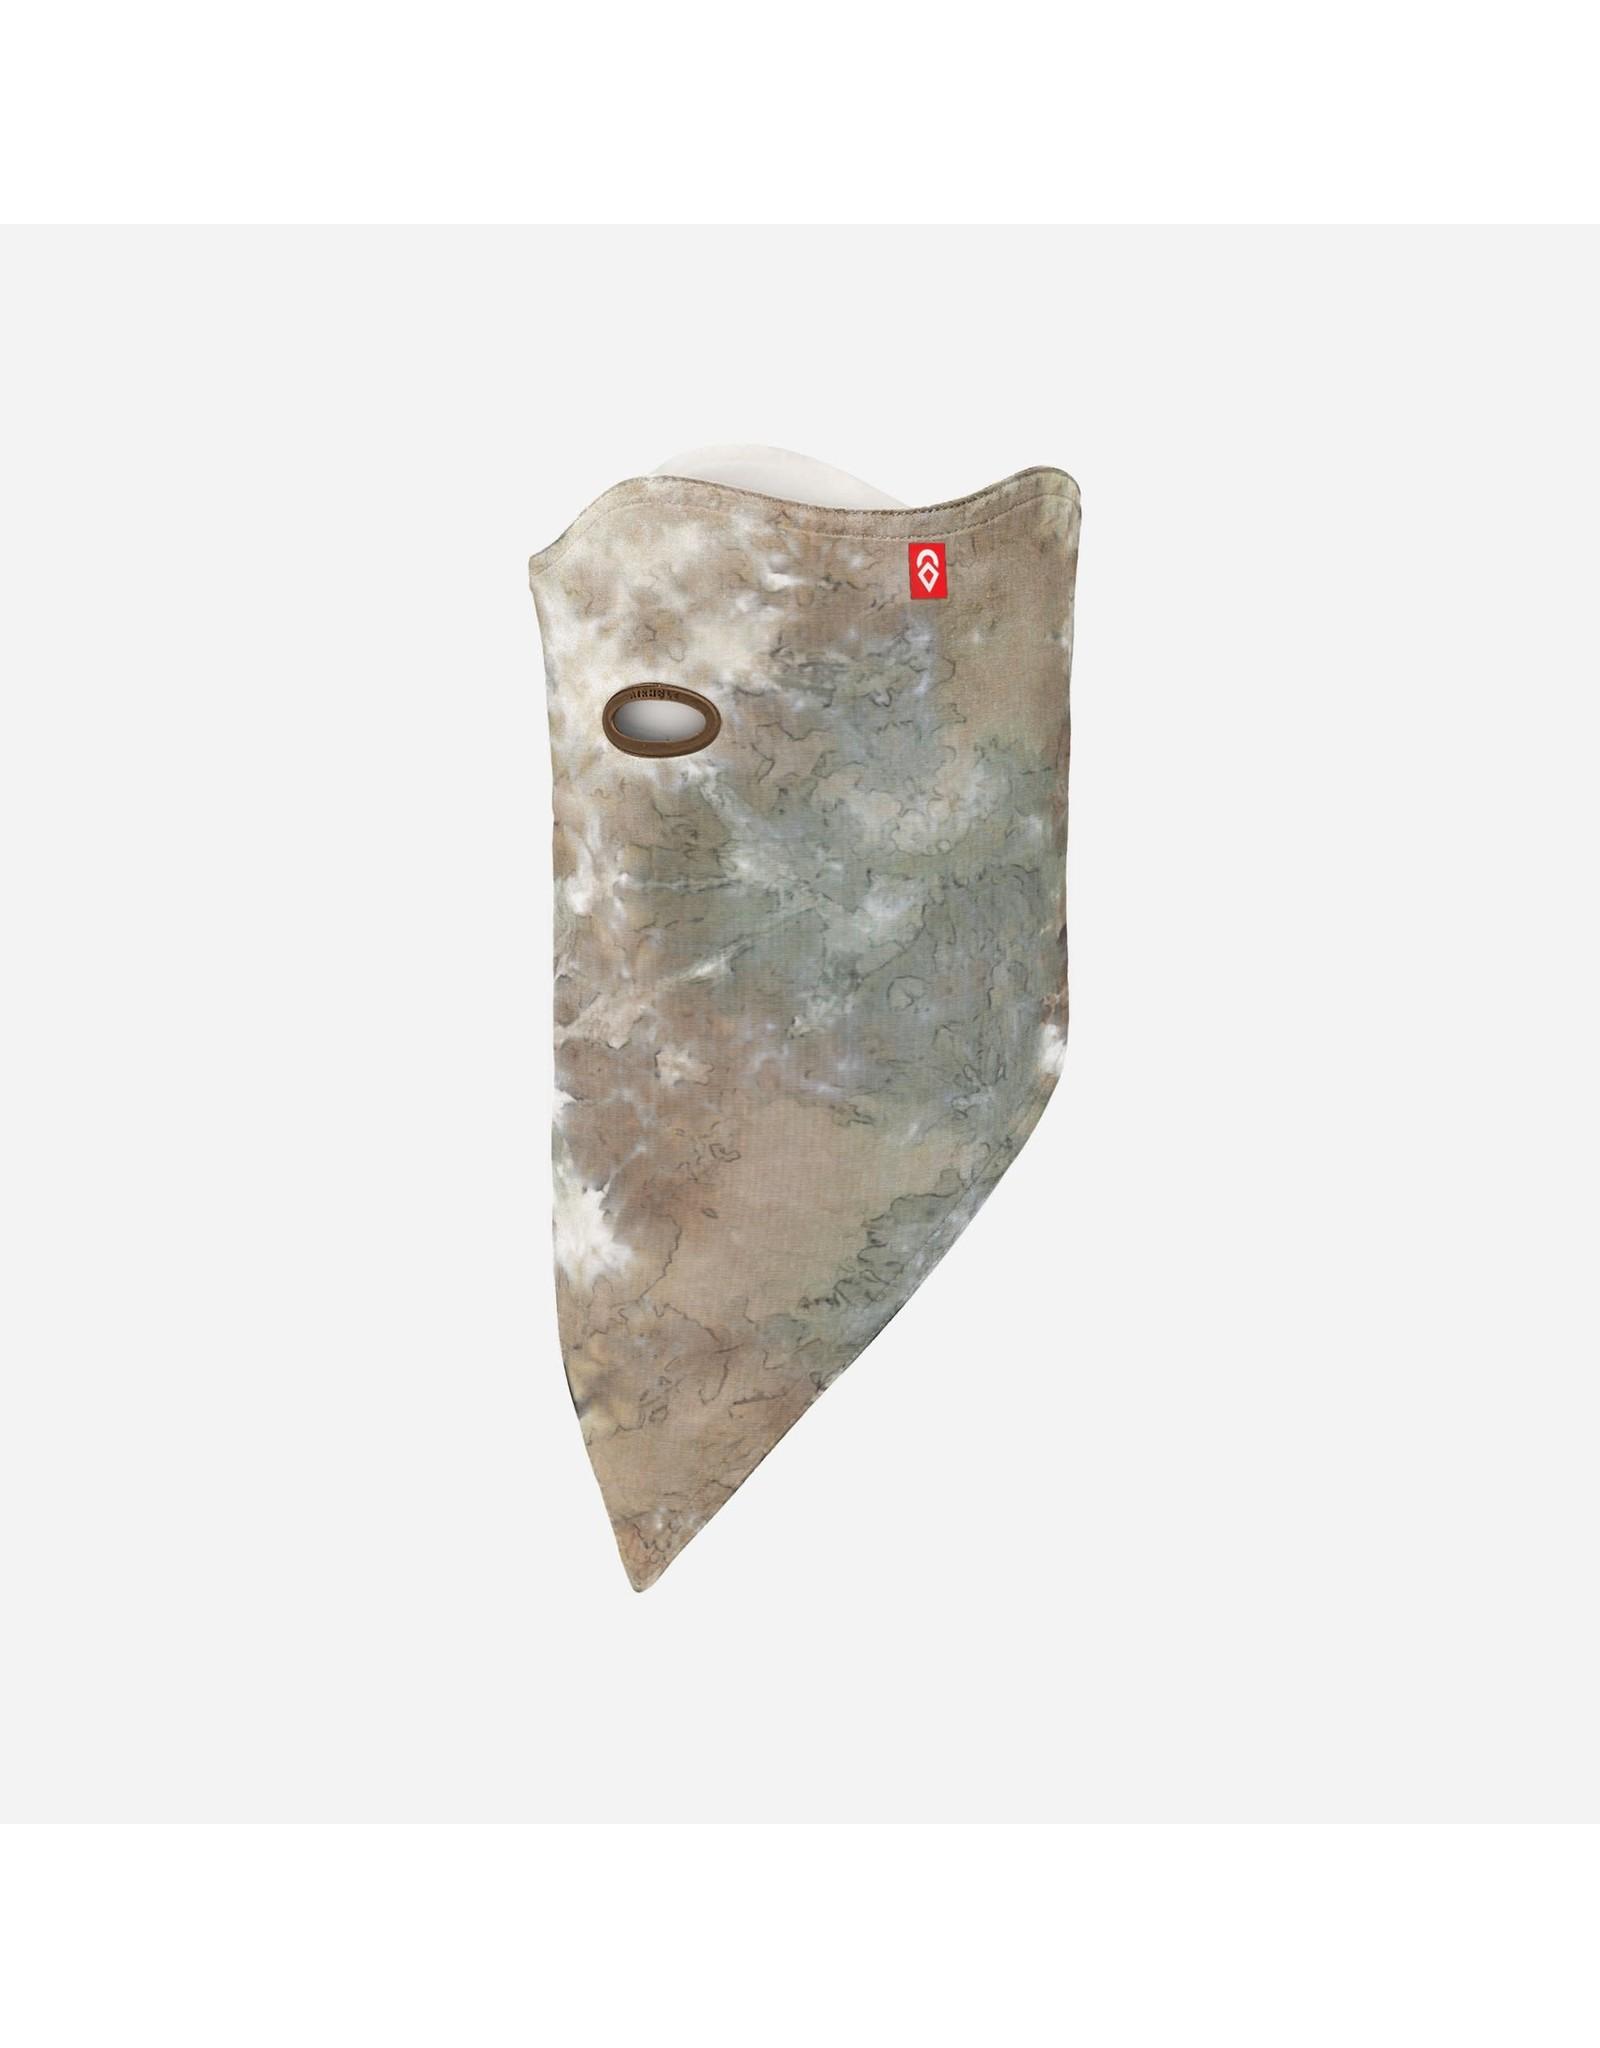 airhole Airhole - masque facemask badlands